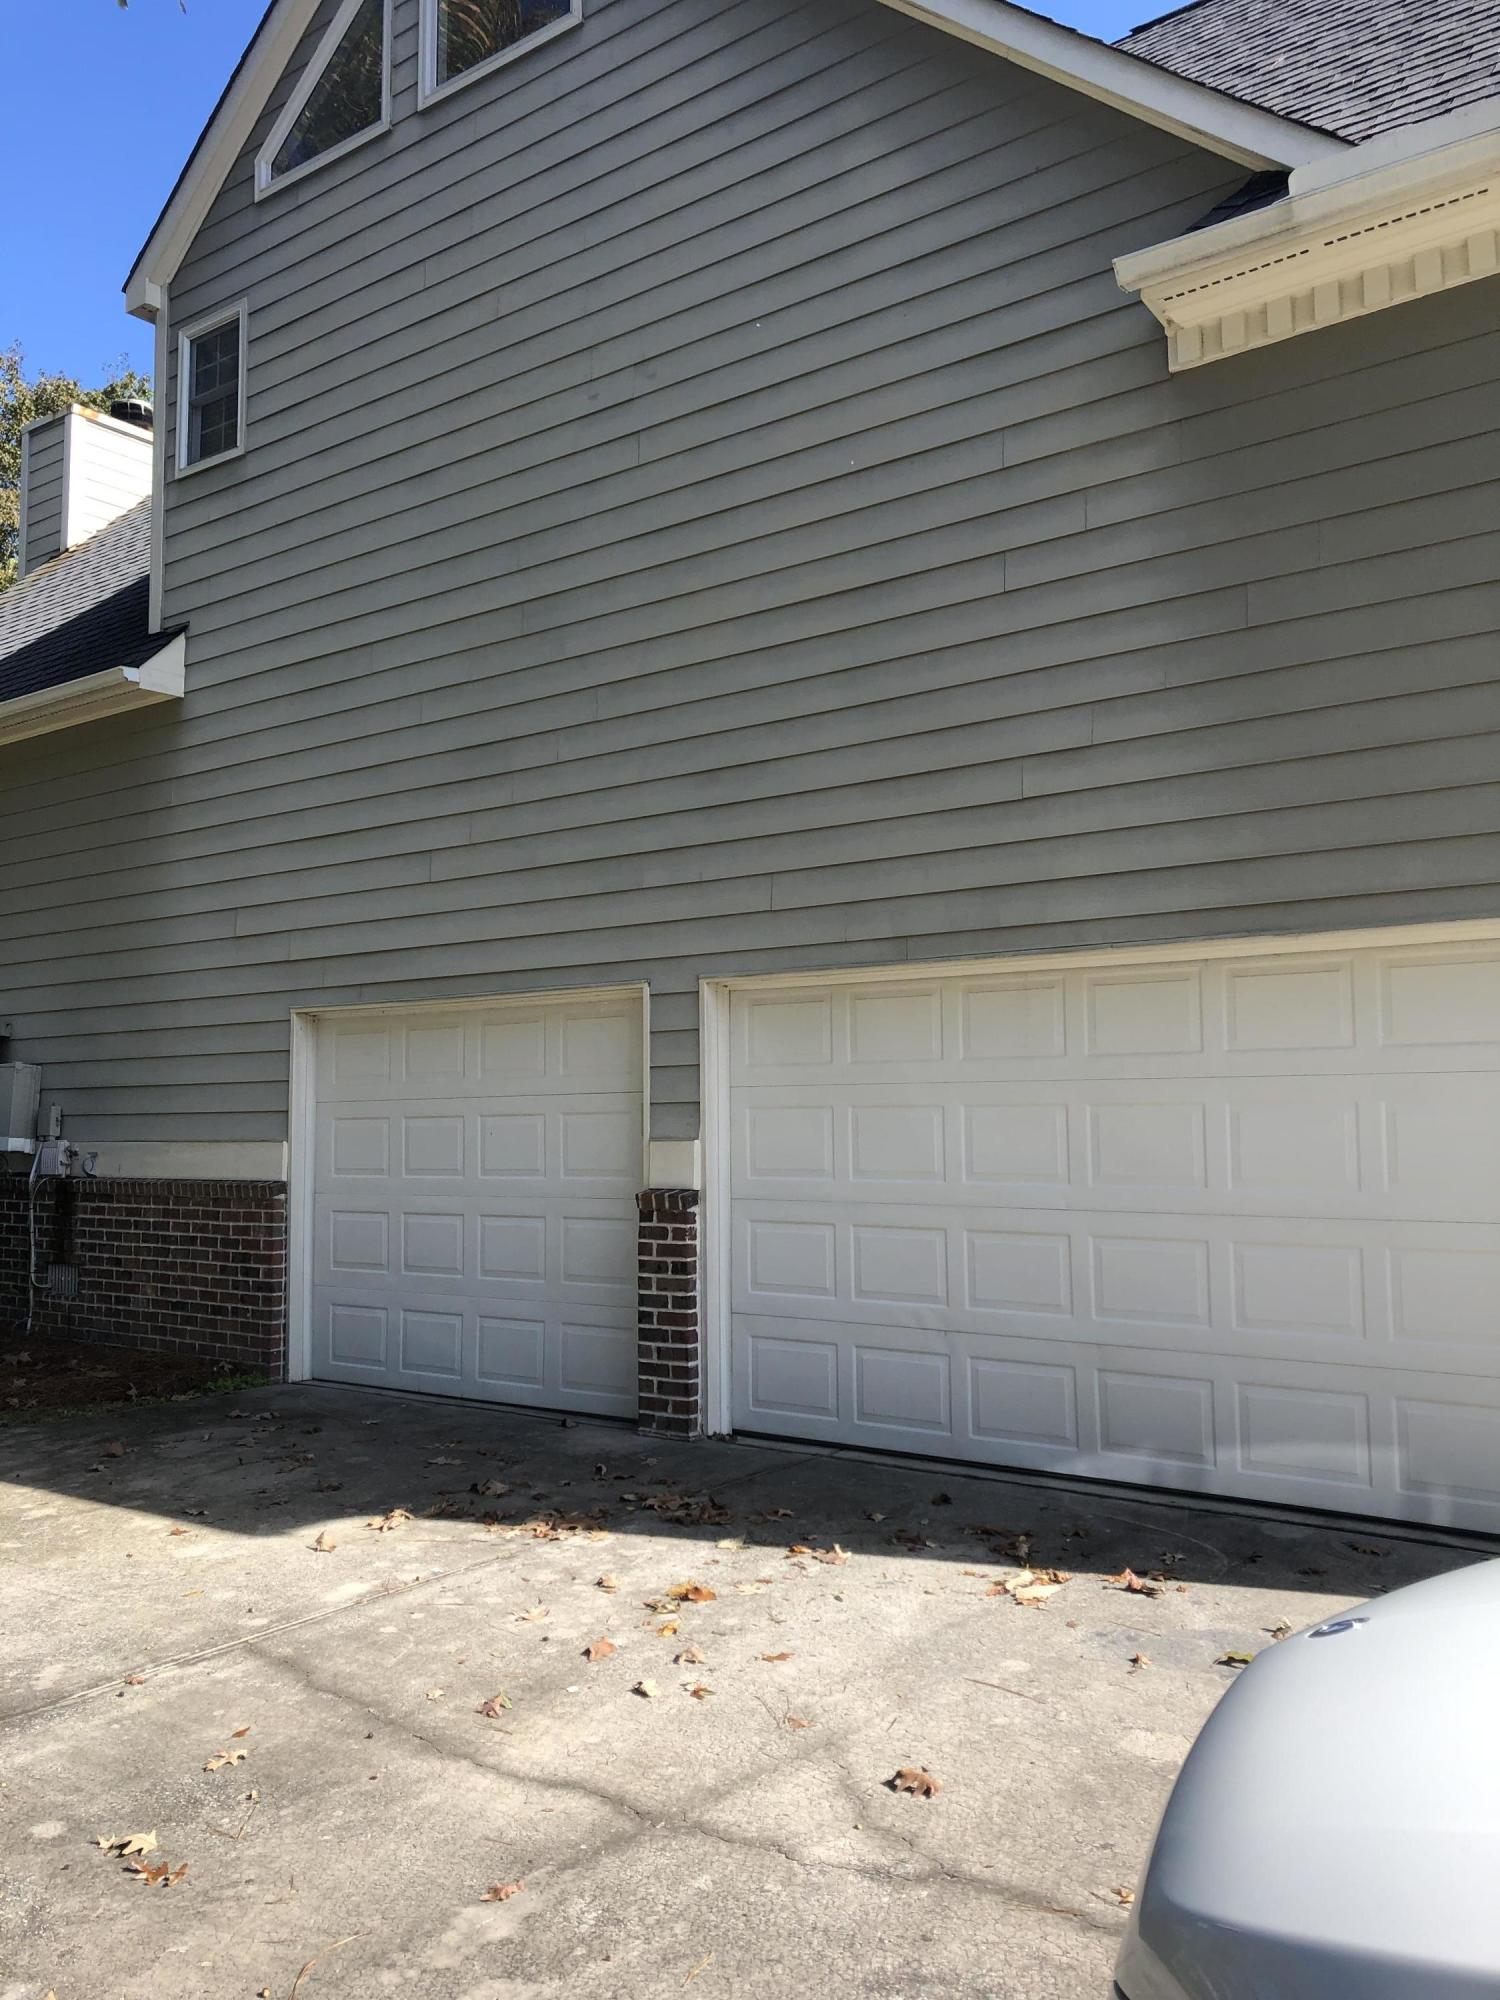 Dunes West Homes For Sale - 2321 Darts Cove, Mount Pleasant, SC - 30